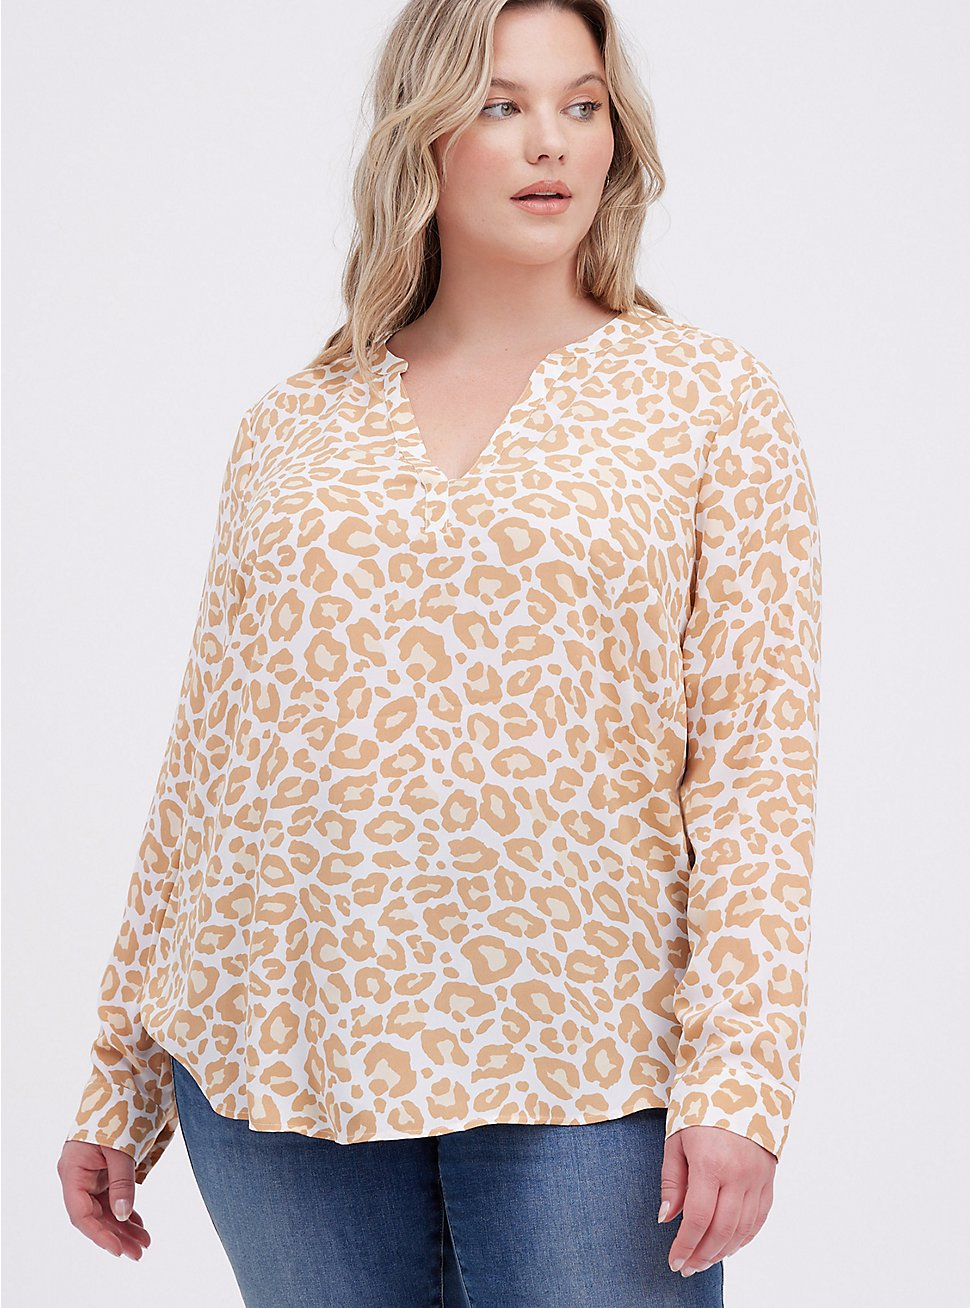 Blouse - Georgette Leopard White, LEOPARD-WHITE, hi-res